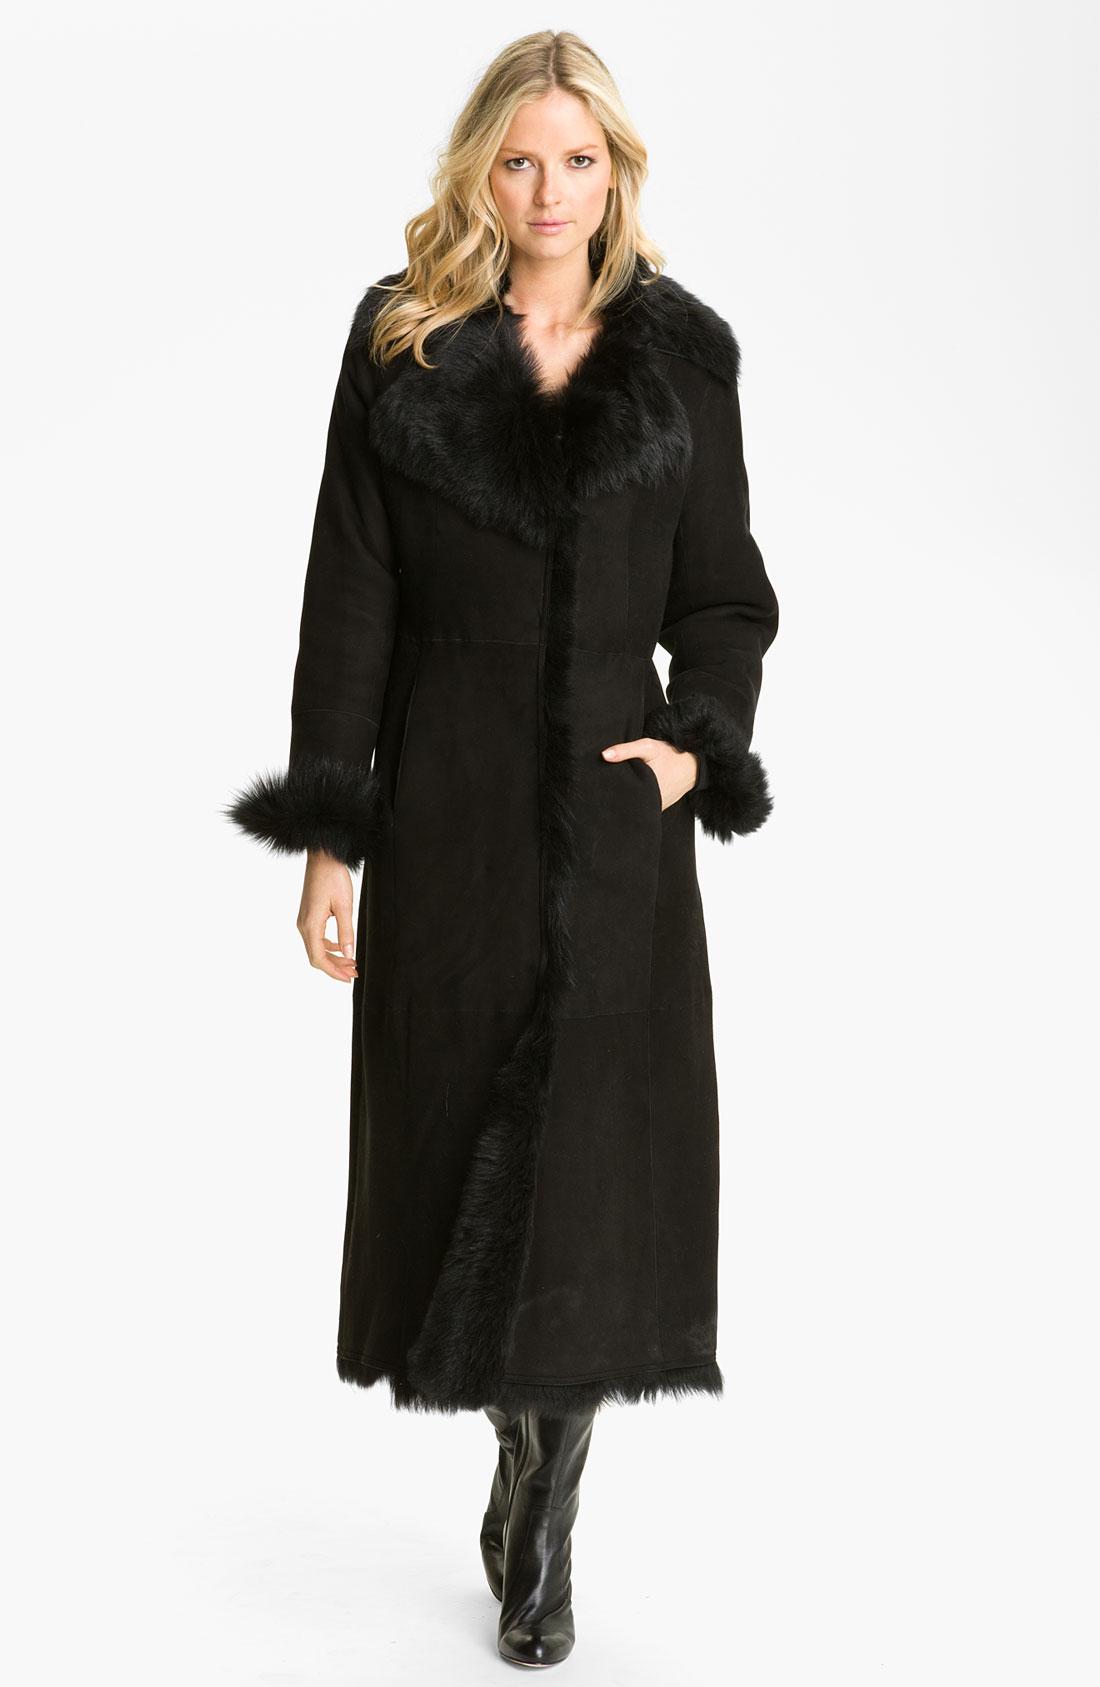 Cole haan Long Shearling Coat in Black | Lyst